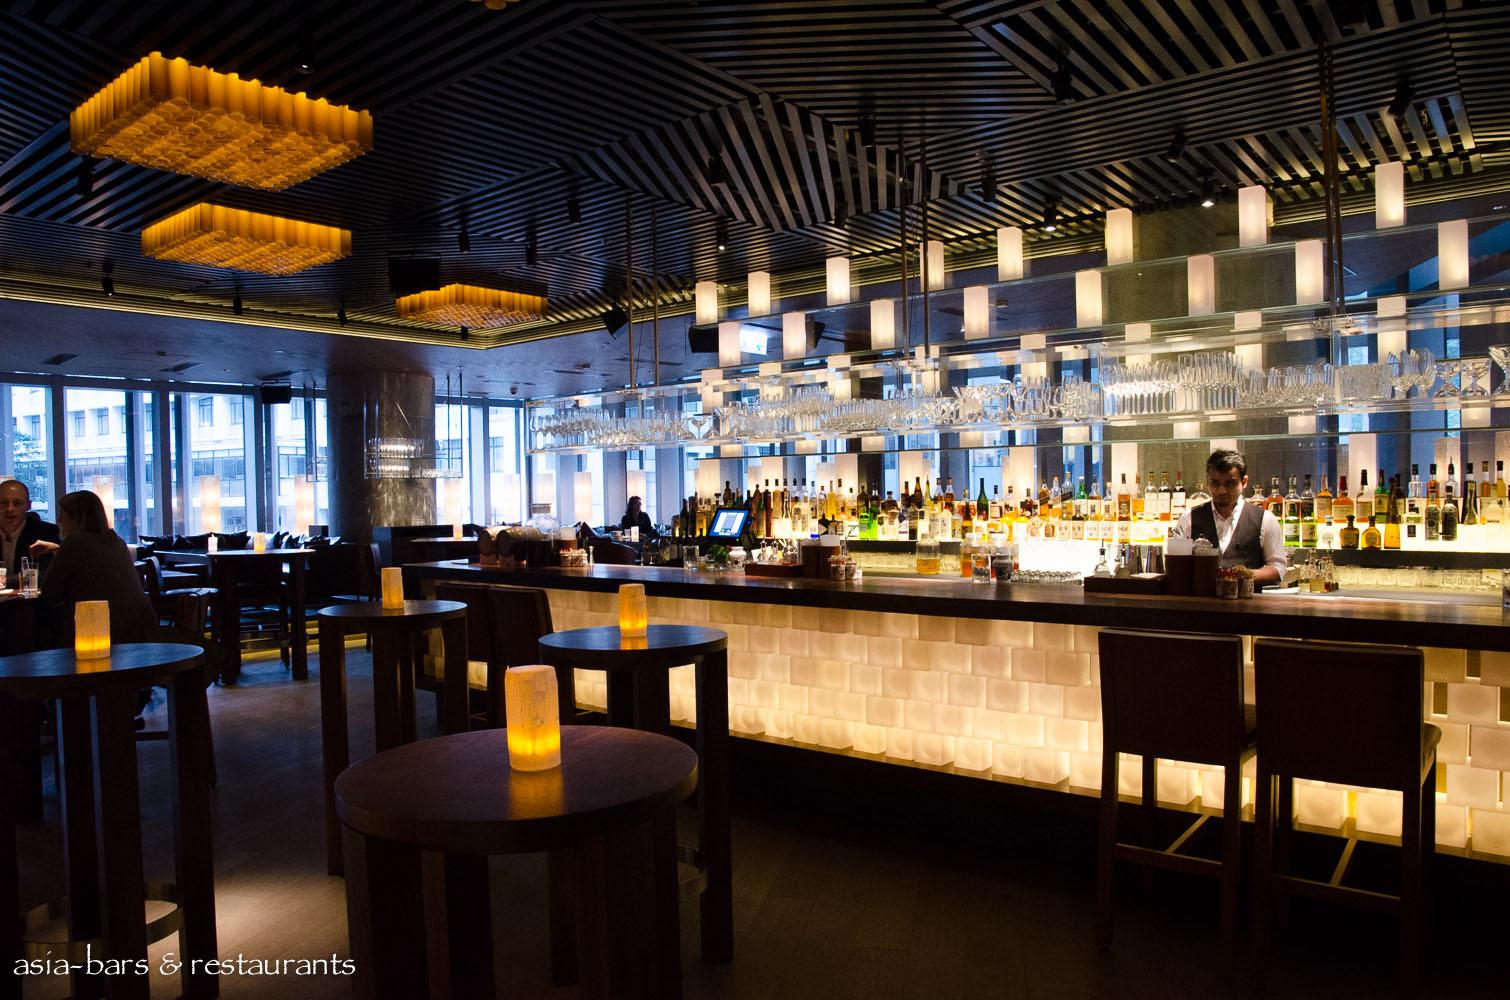 Zuma Hong Kong Acclaimed Japanese Restaurant Unveils New Bar Amp Lounge Asia Bars Amp Restaurants